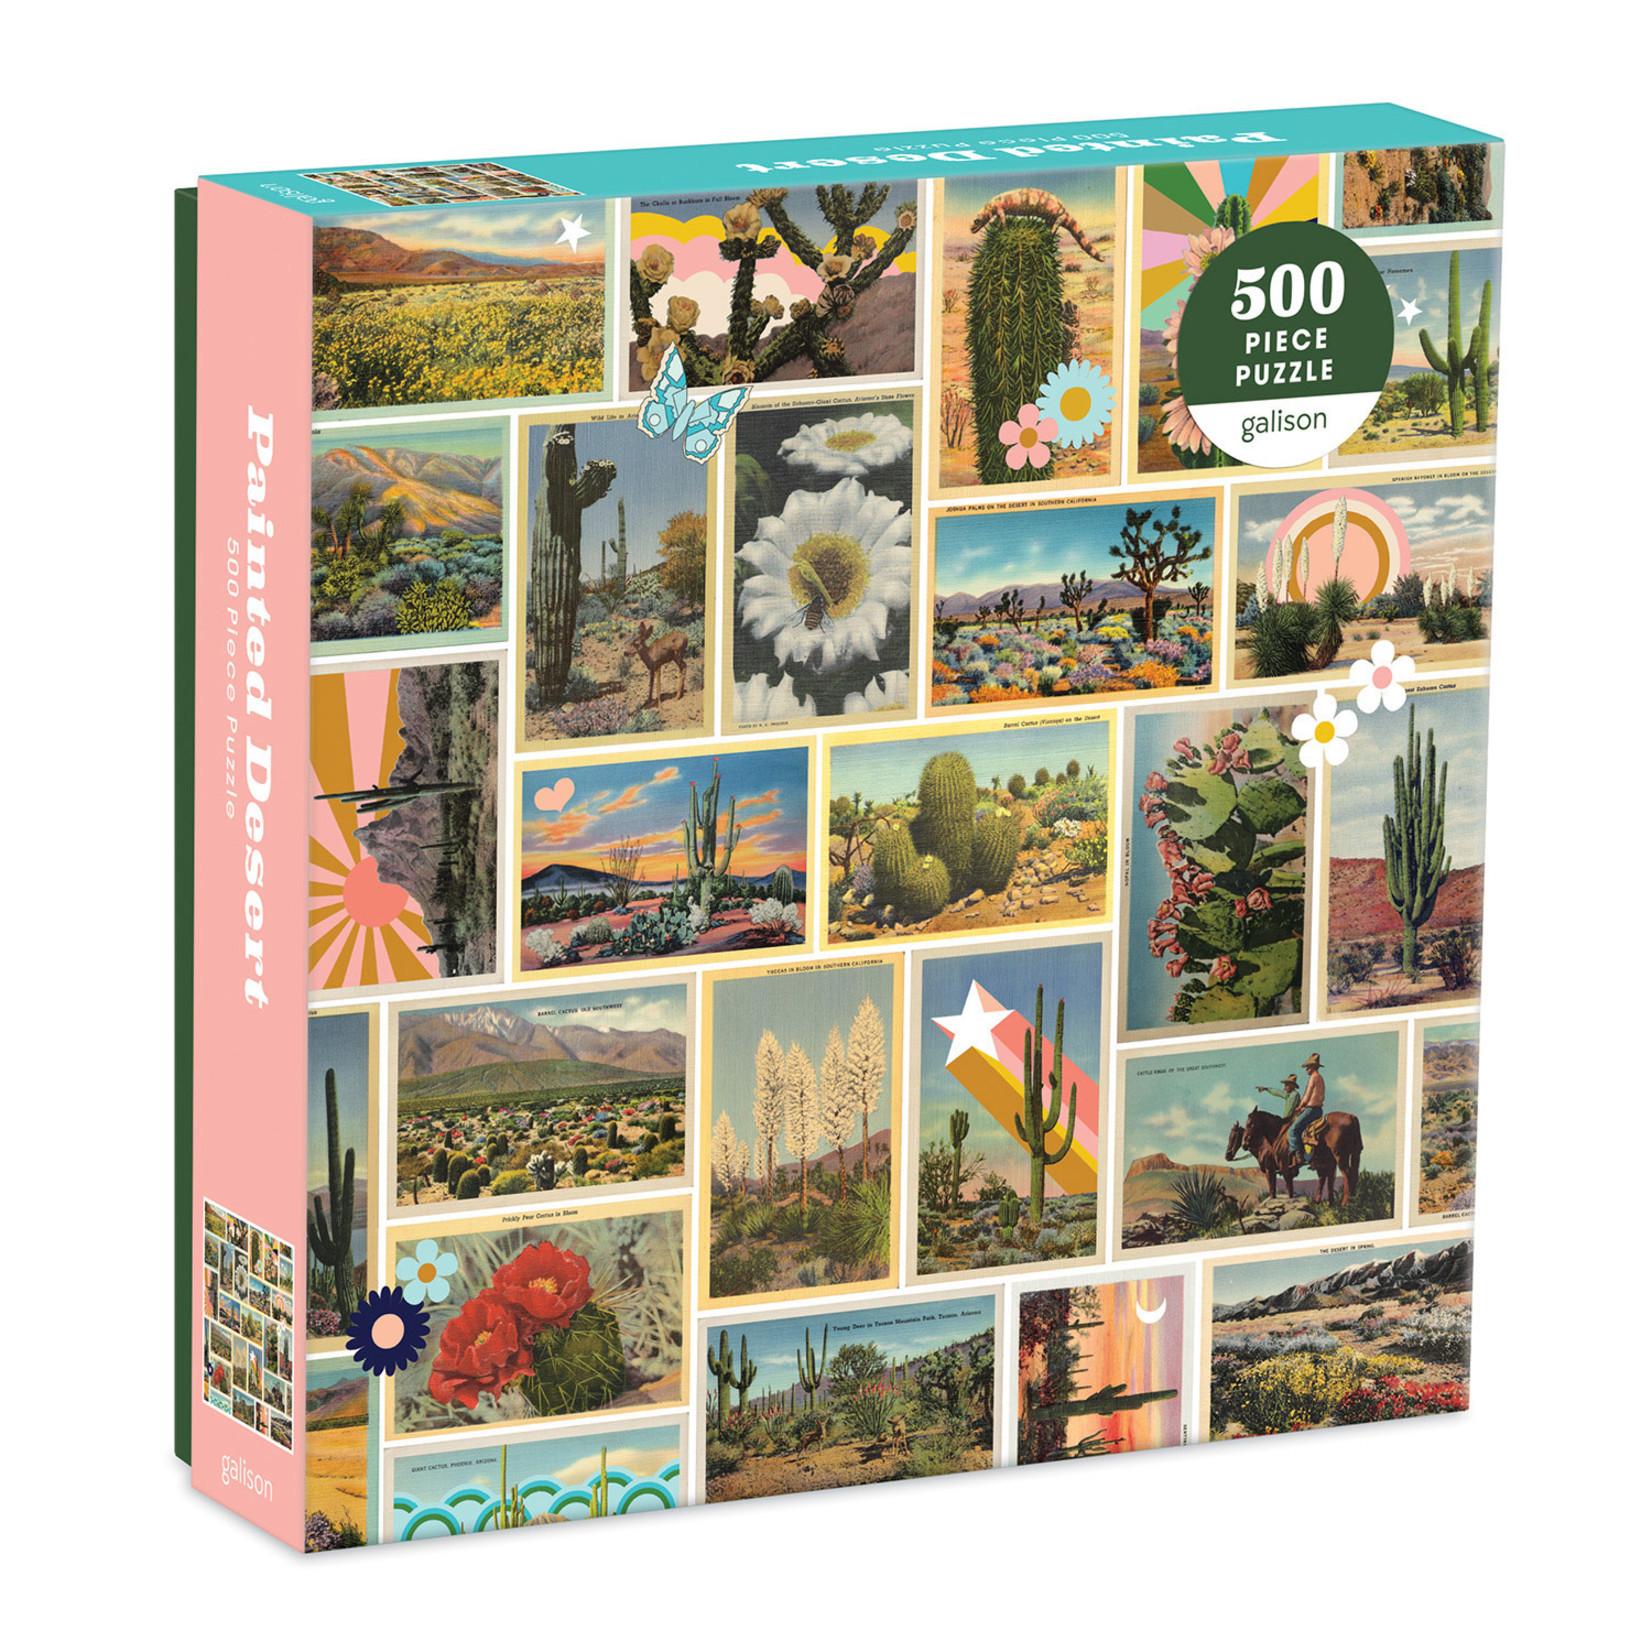 Galison Galison - 500 Piece Puzzle: Painted Desert